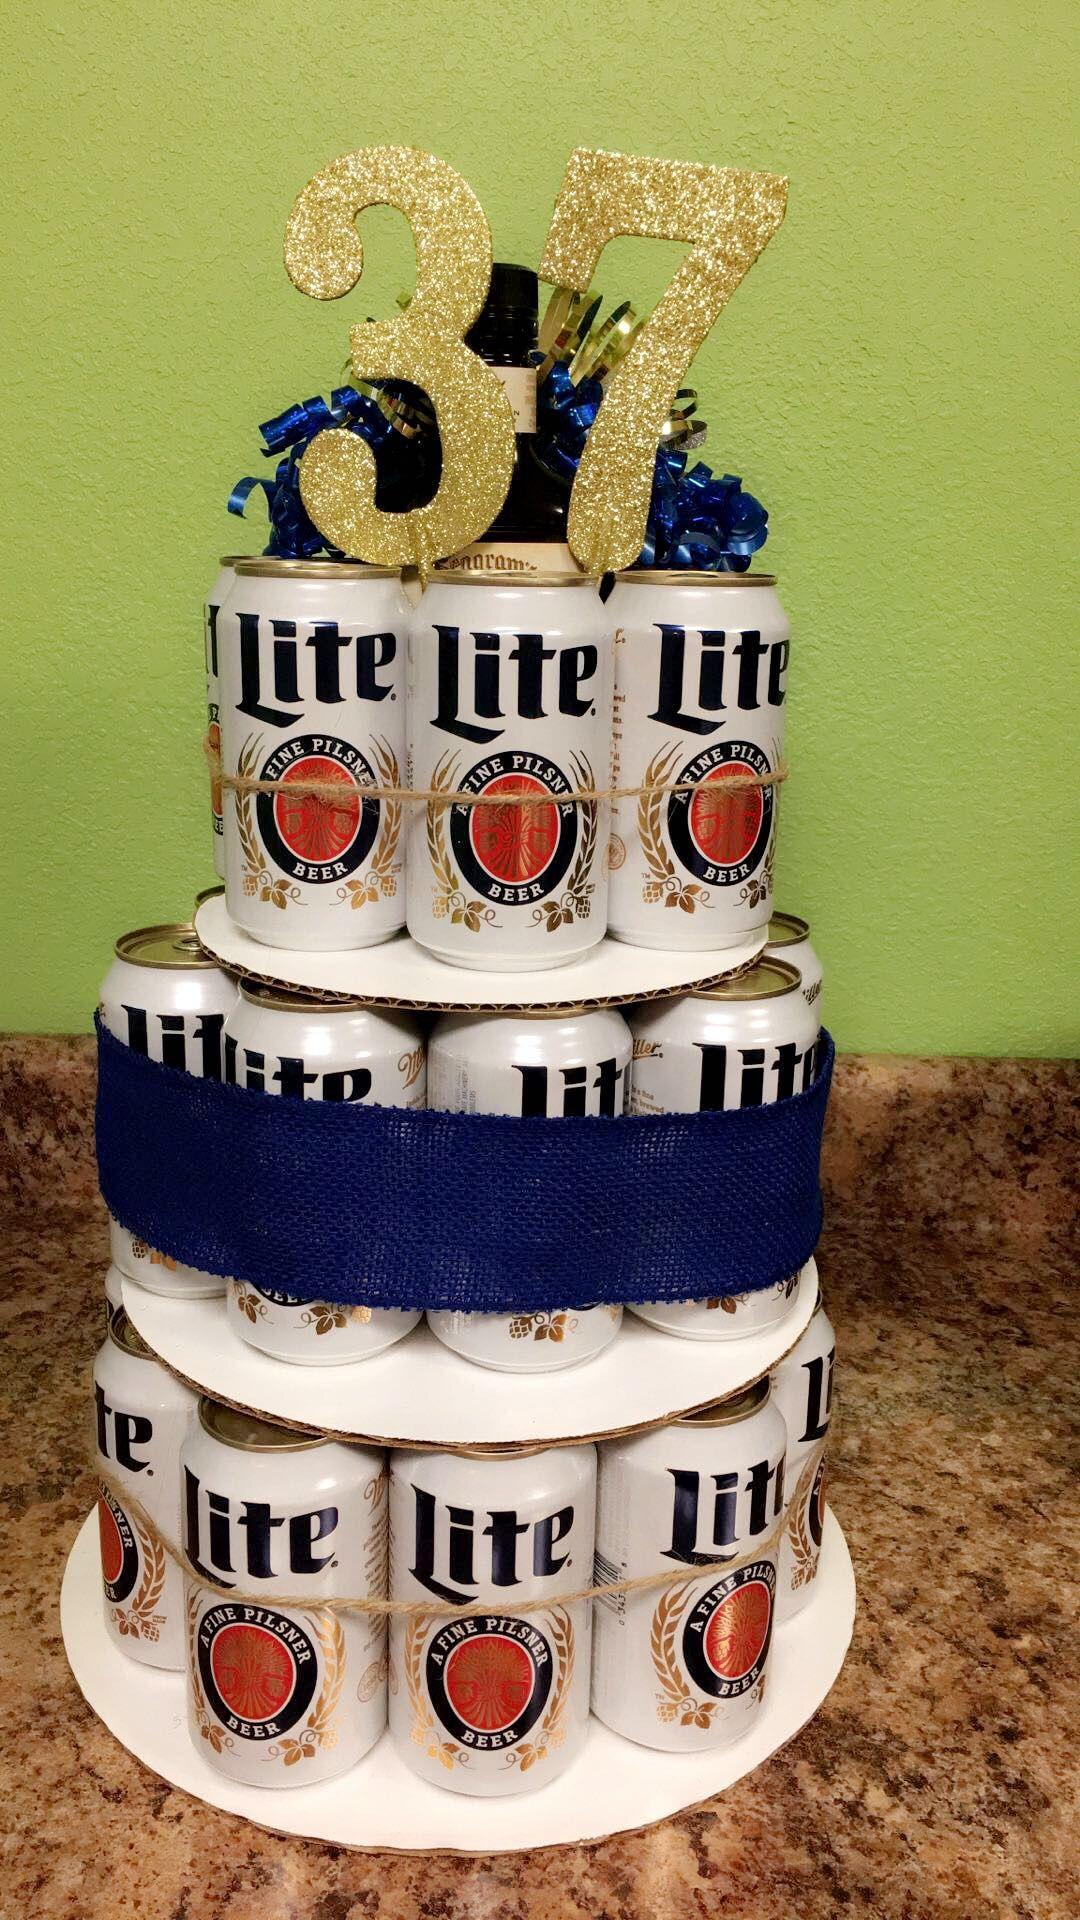 Beer Cake Miller Lite 37th Birthday I Made This Cake For